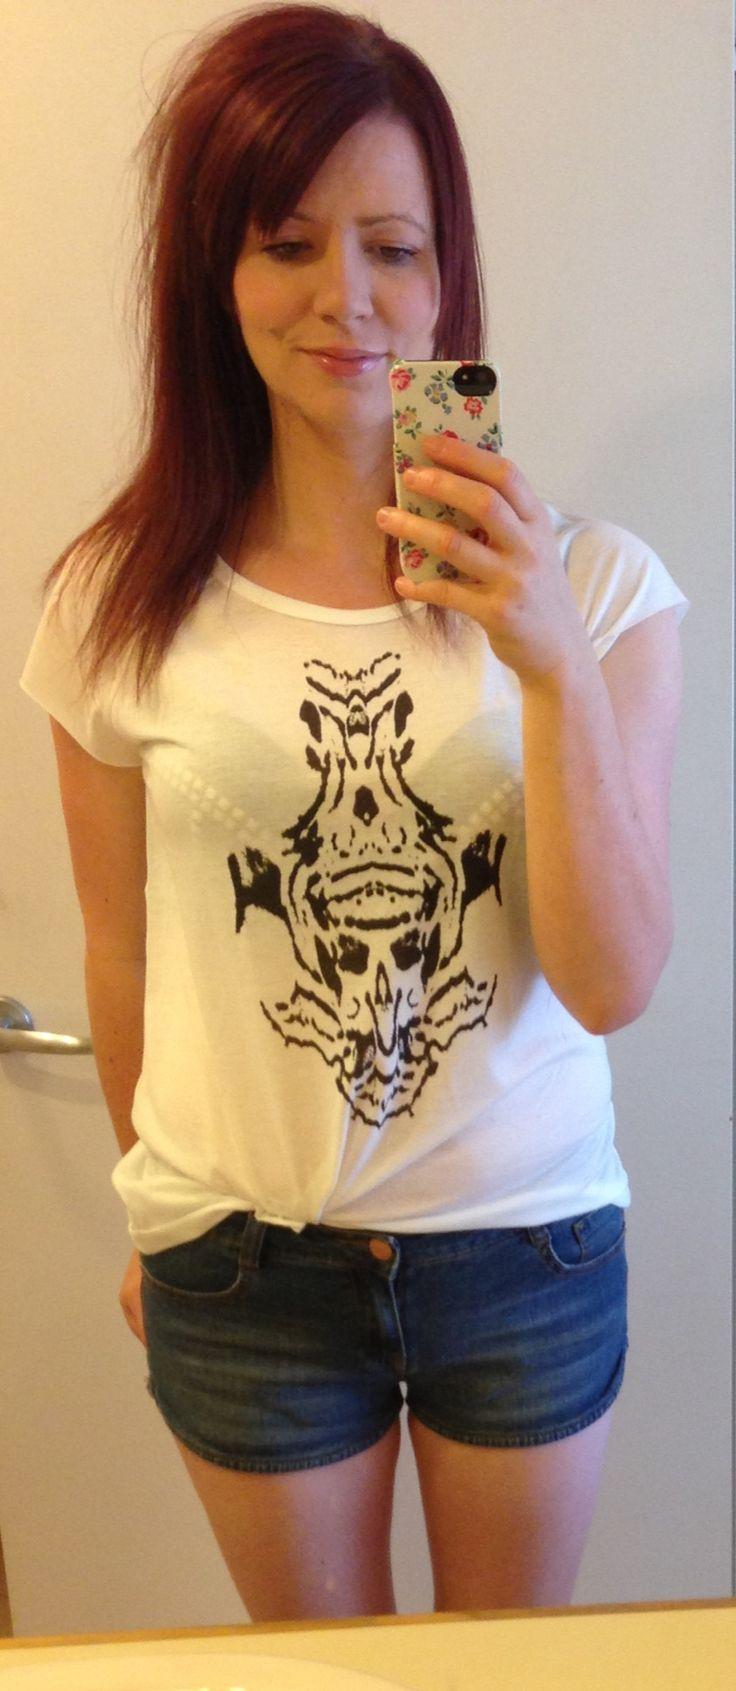 21/9/13 Willow tshirt, Target jean shorts, minimal makeup. Off duty weekend.